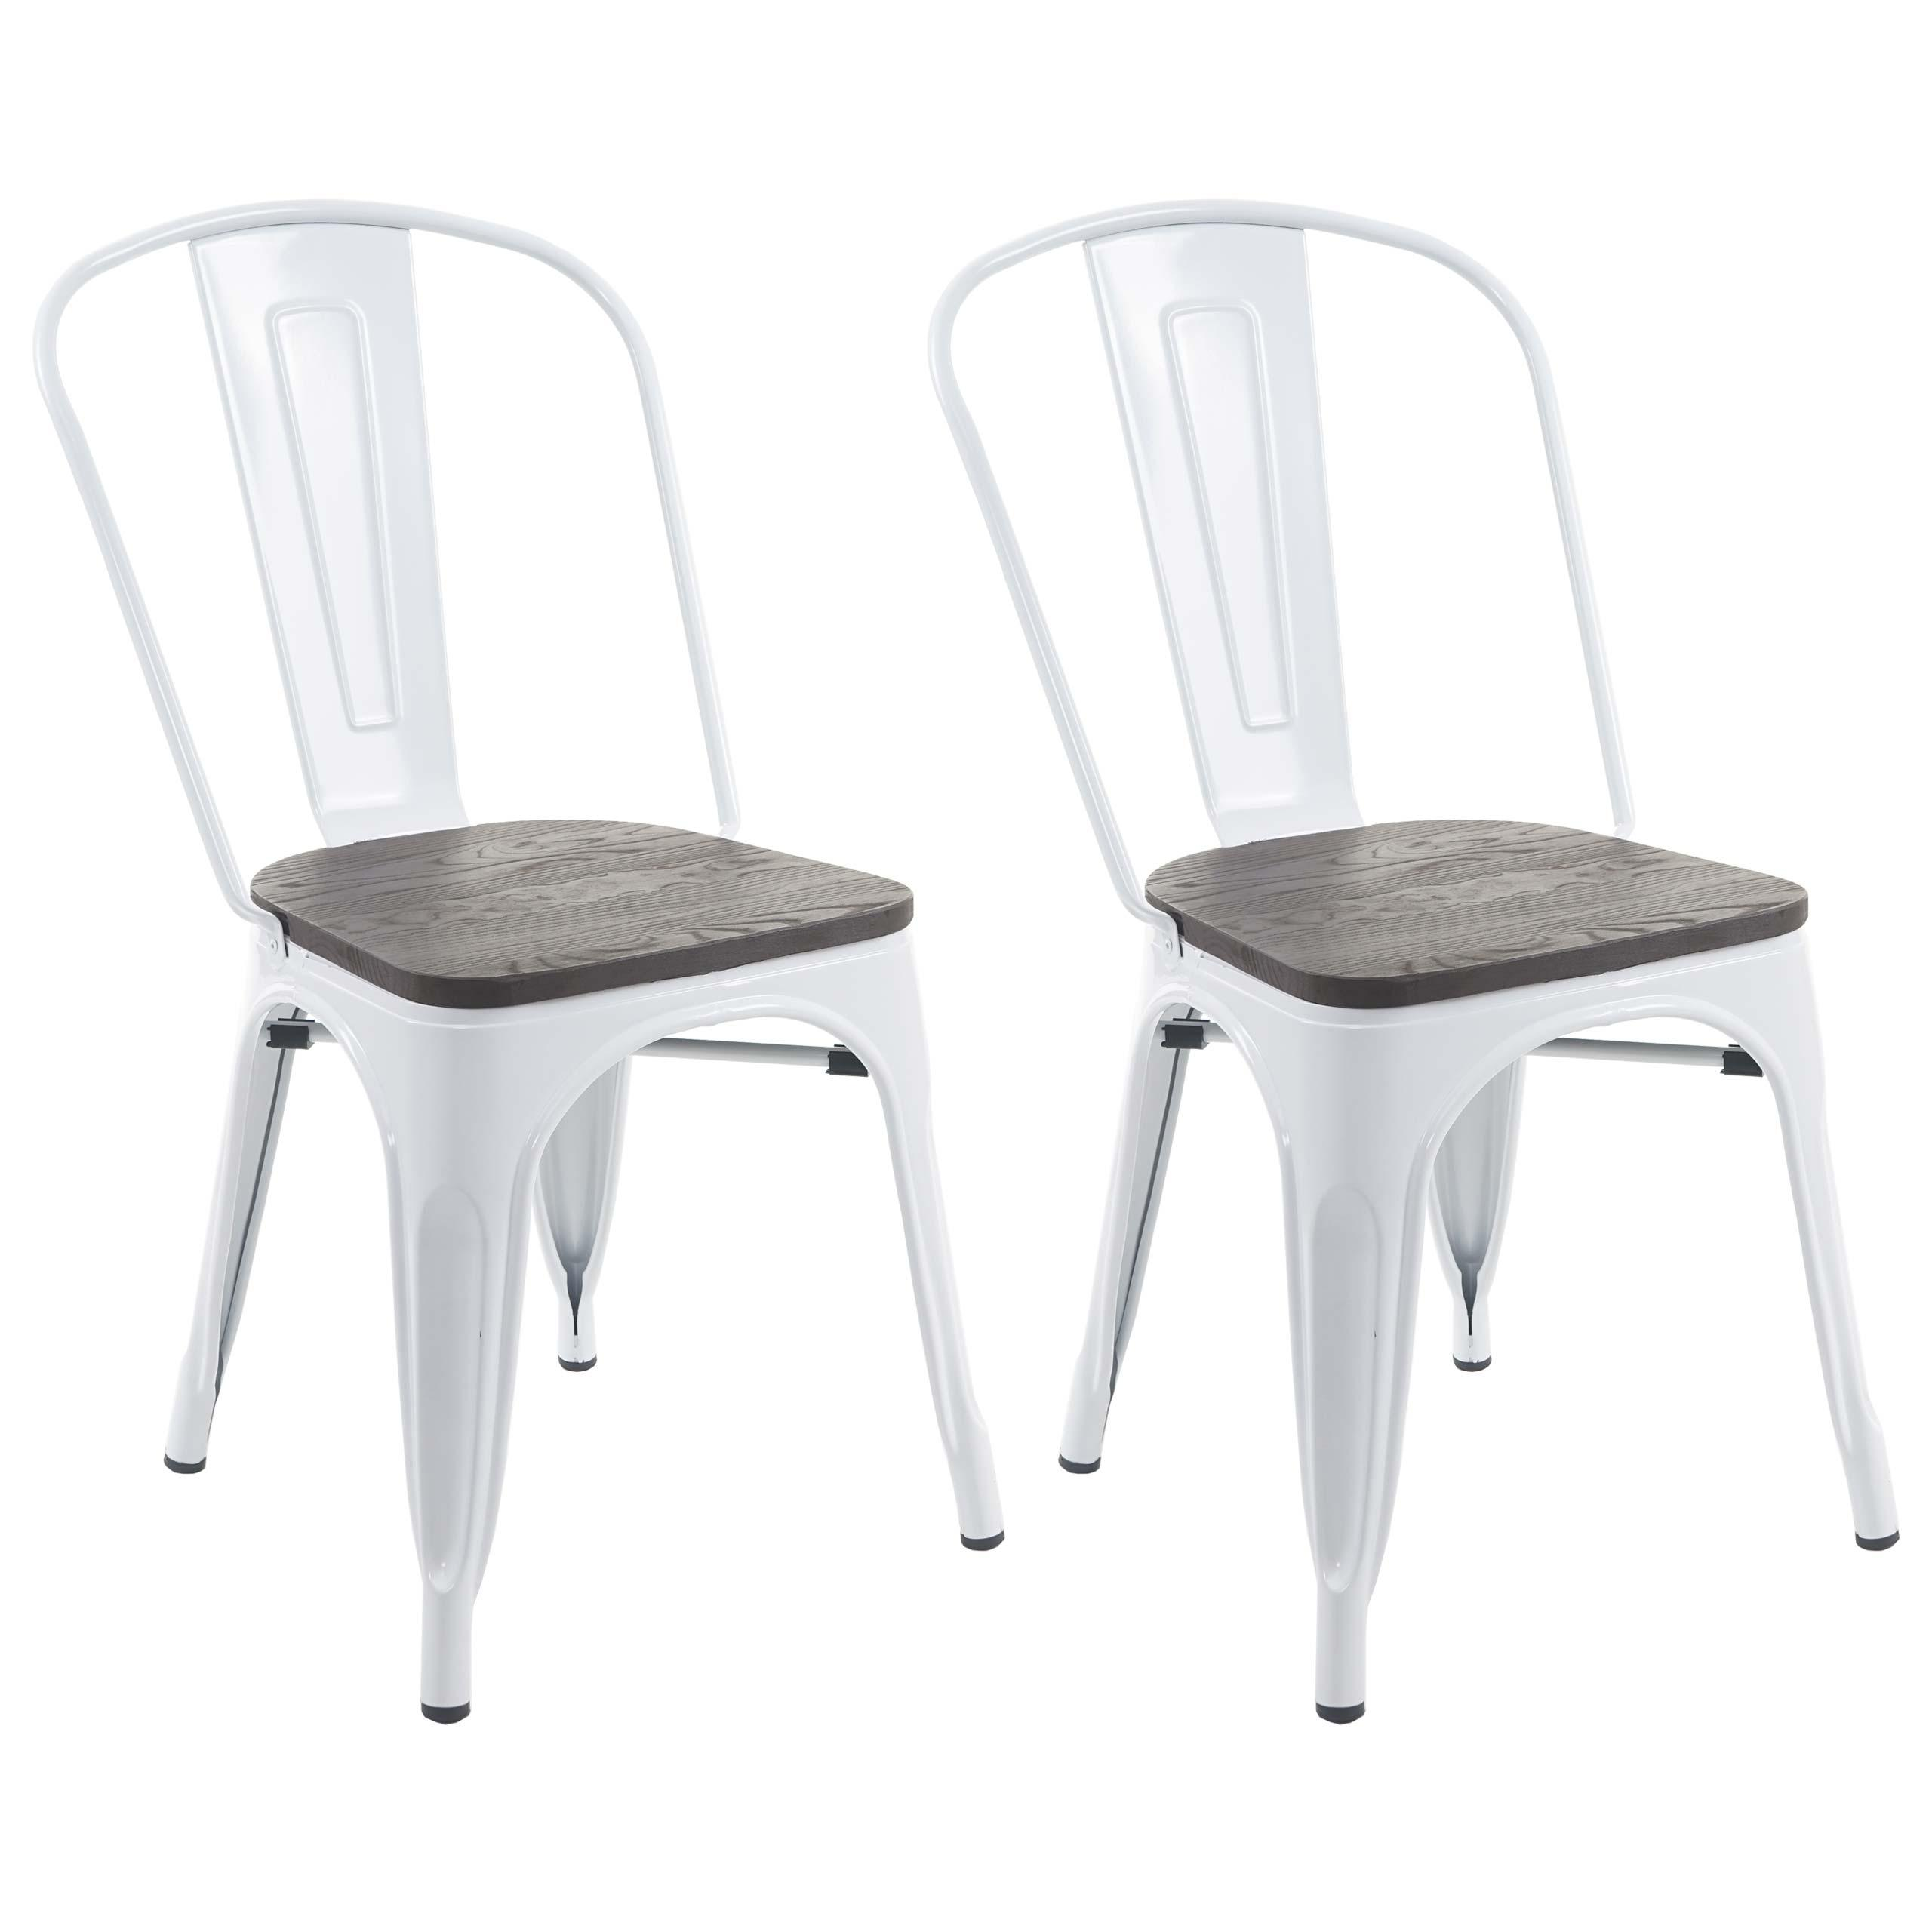 Sitzfläche Stuhl Maße